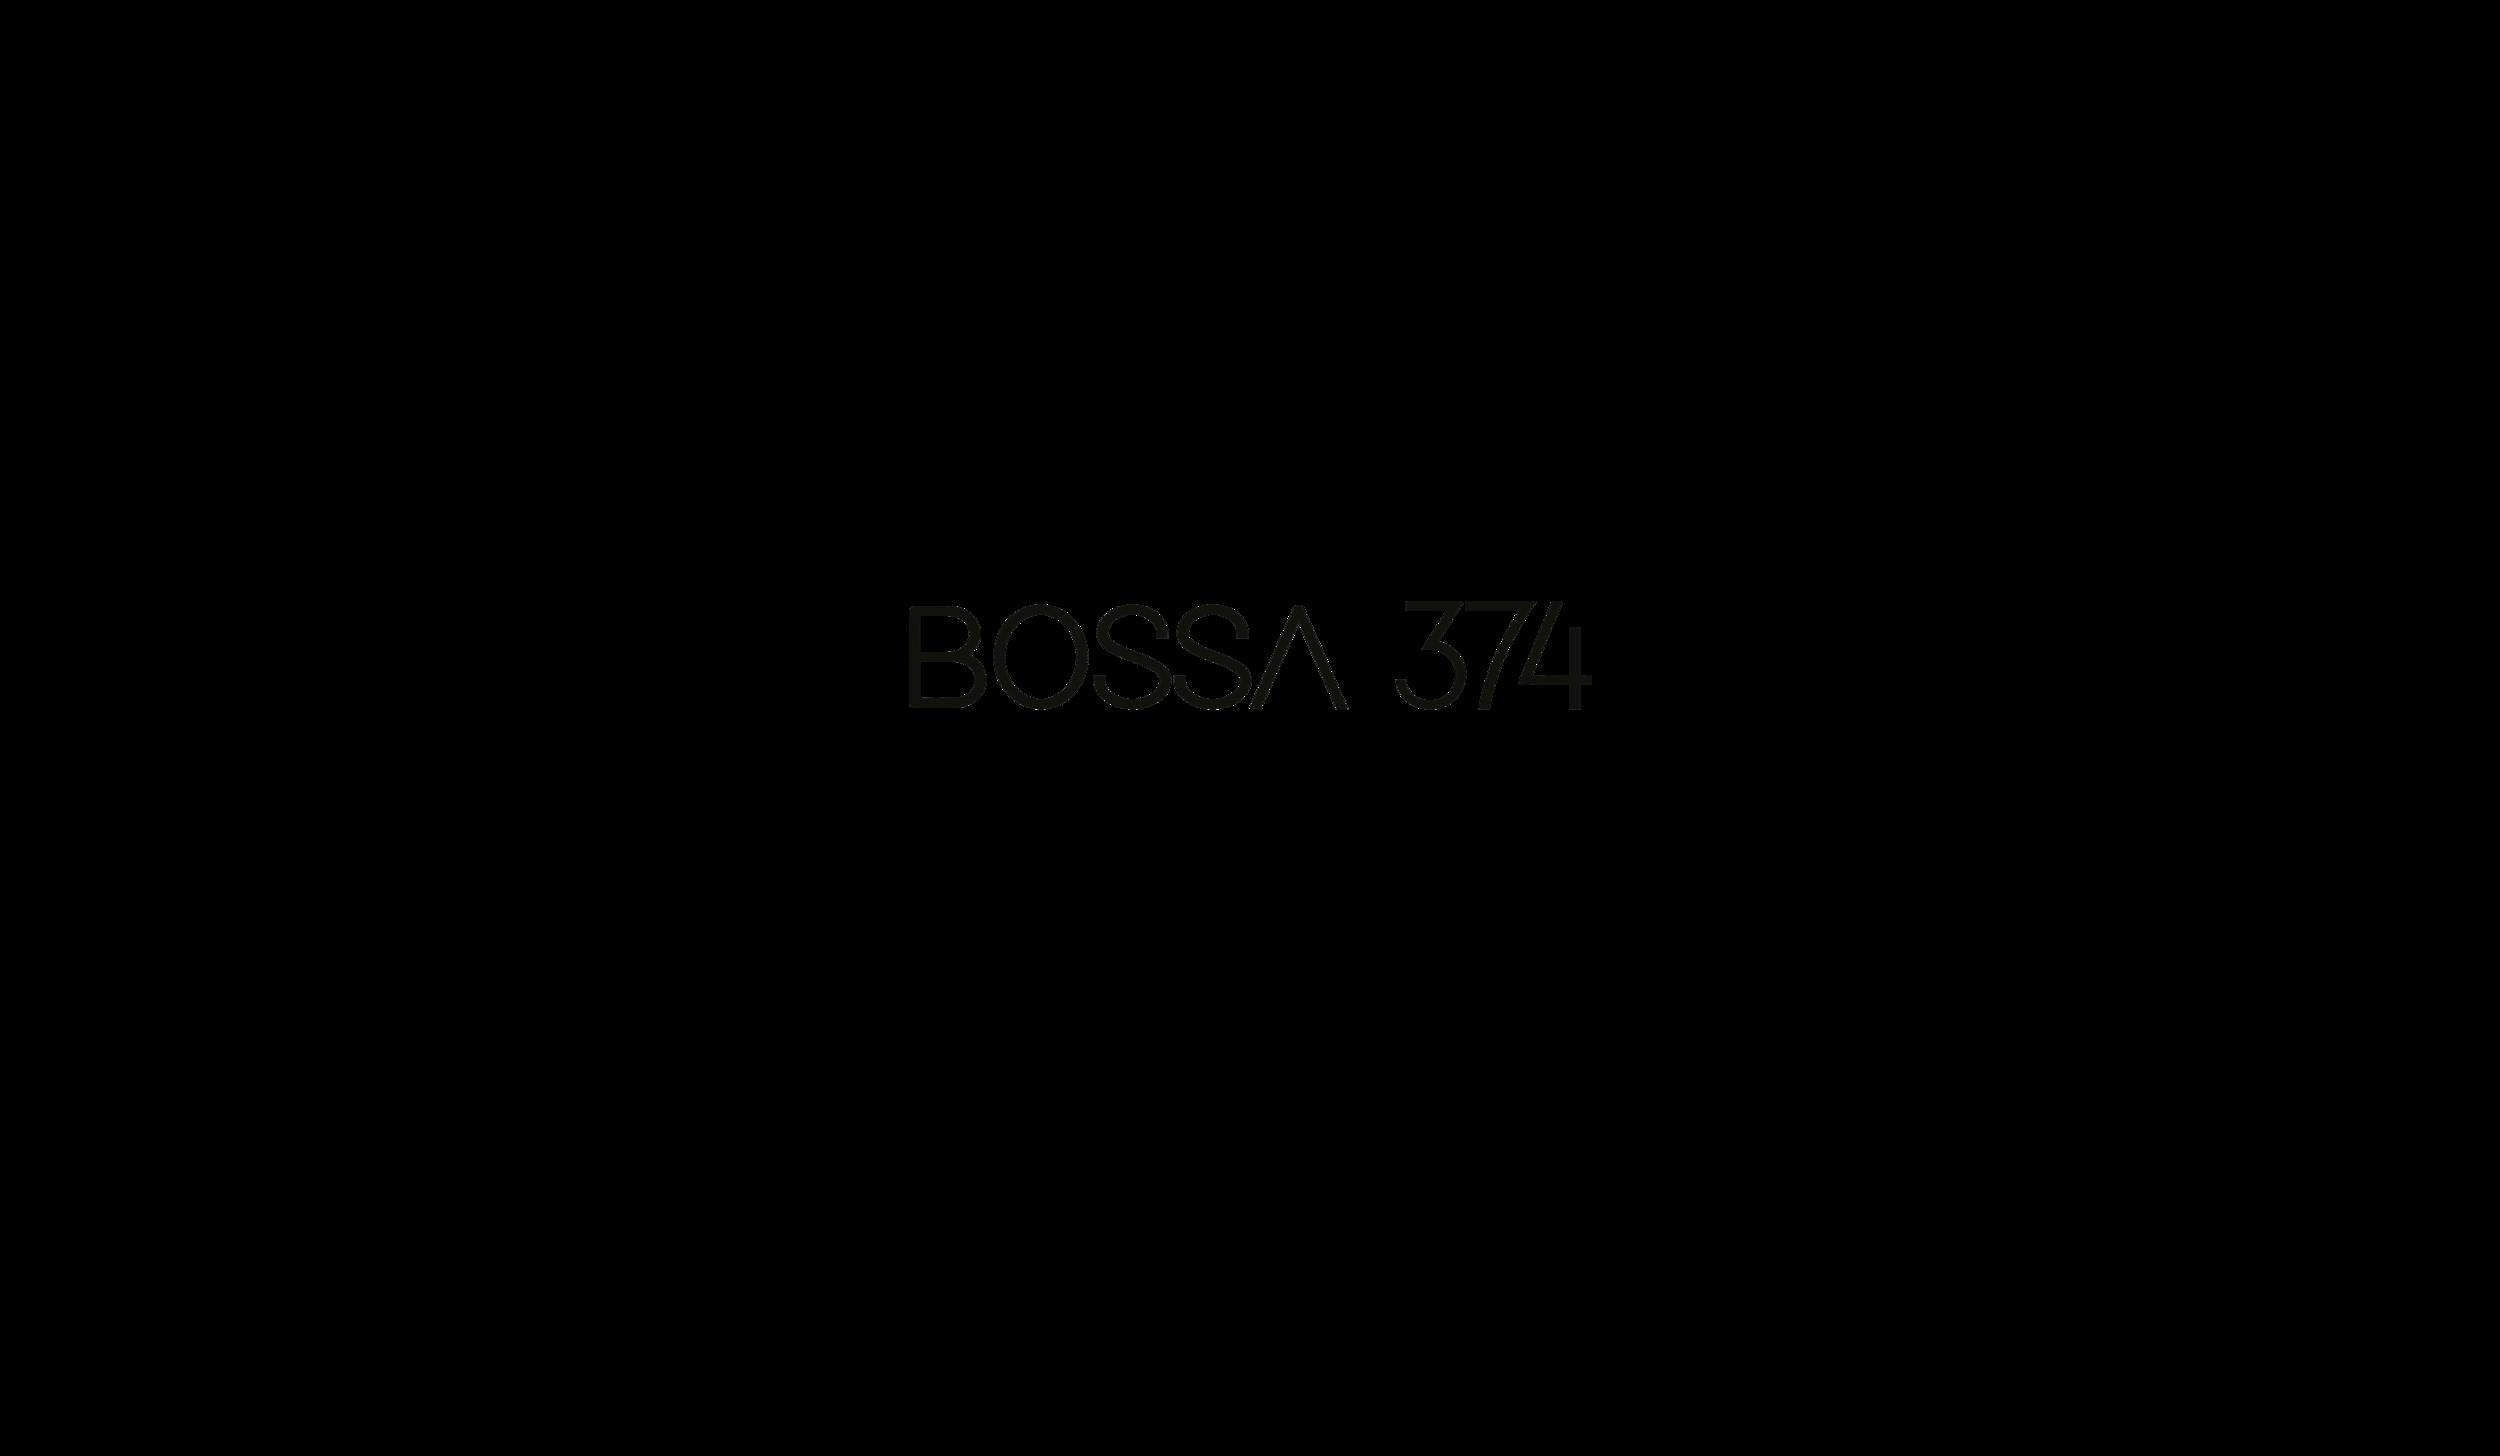 Untitled1-copy_0017_af_logo_Bossa374_positivo_rgb.jpg.png